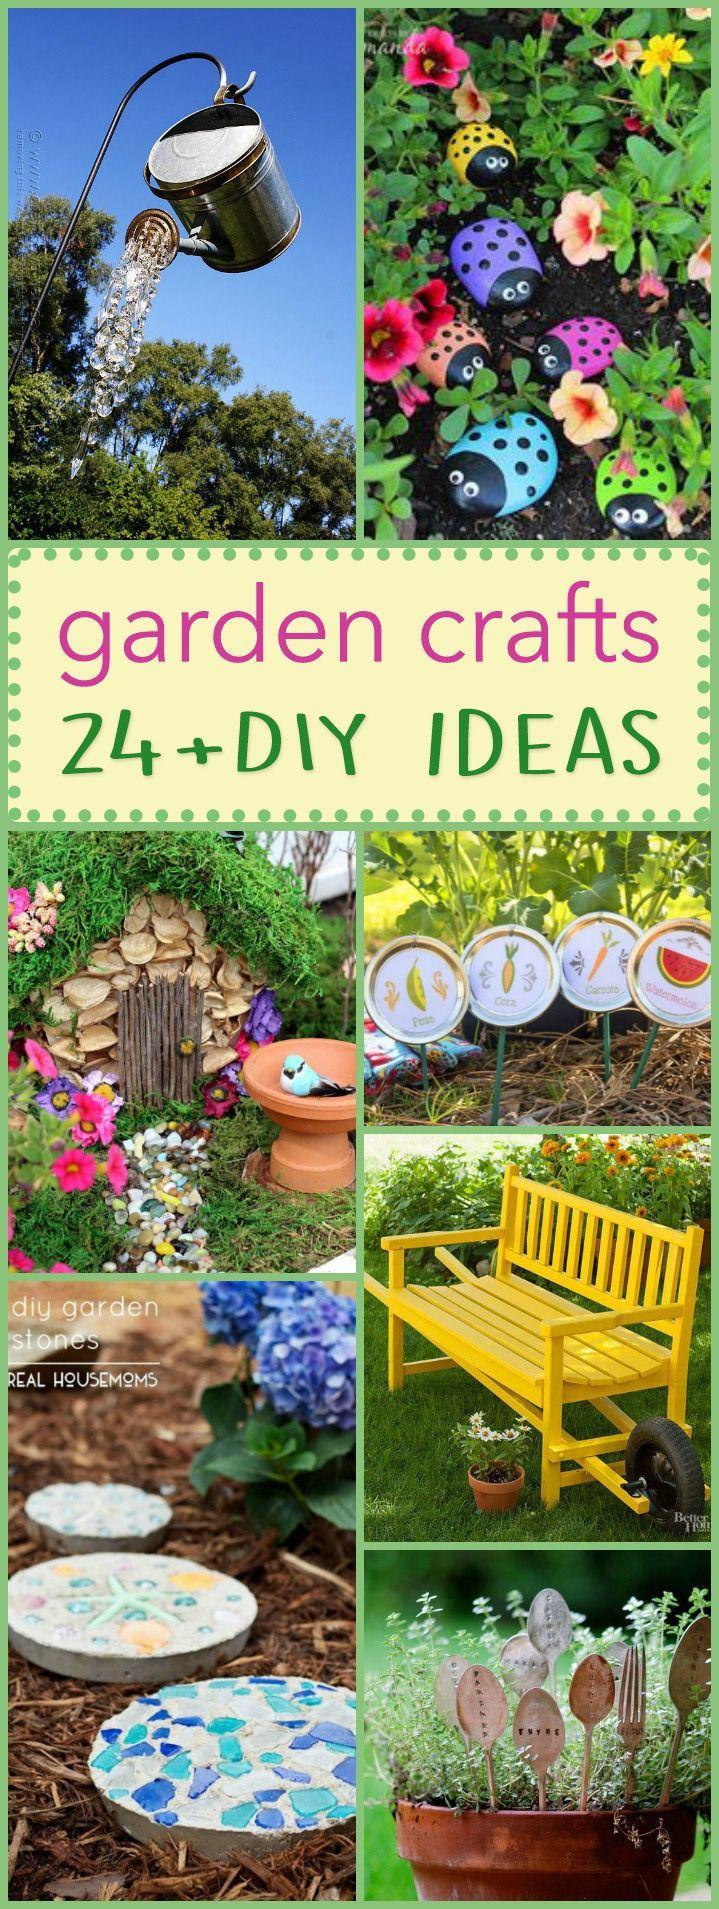 Homemade garden art ideas - Best 20 Garden Crafts Ideas On Pinterest Diy Yard Decor Outdoor Crafts And Diy Garden Decor